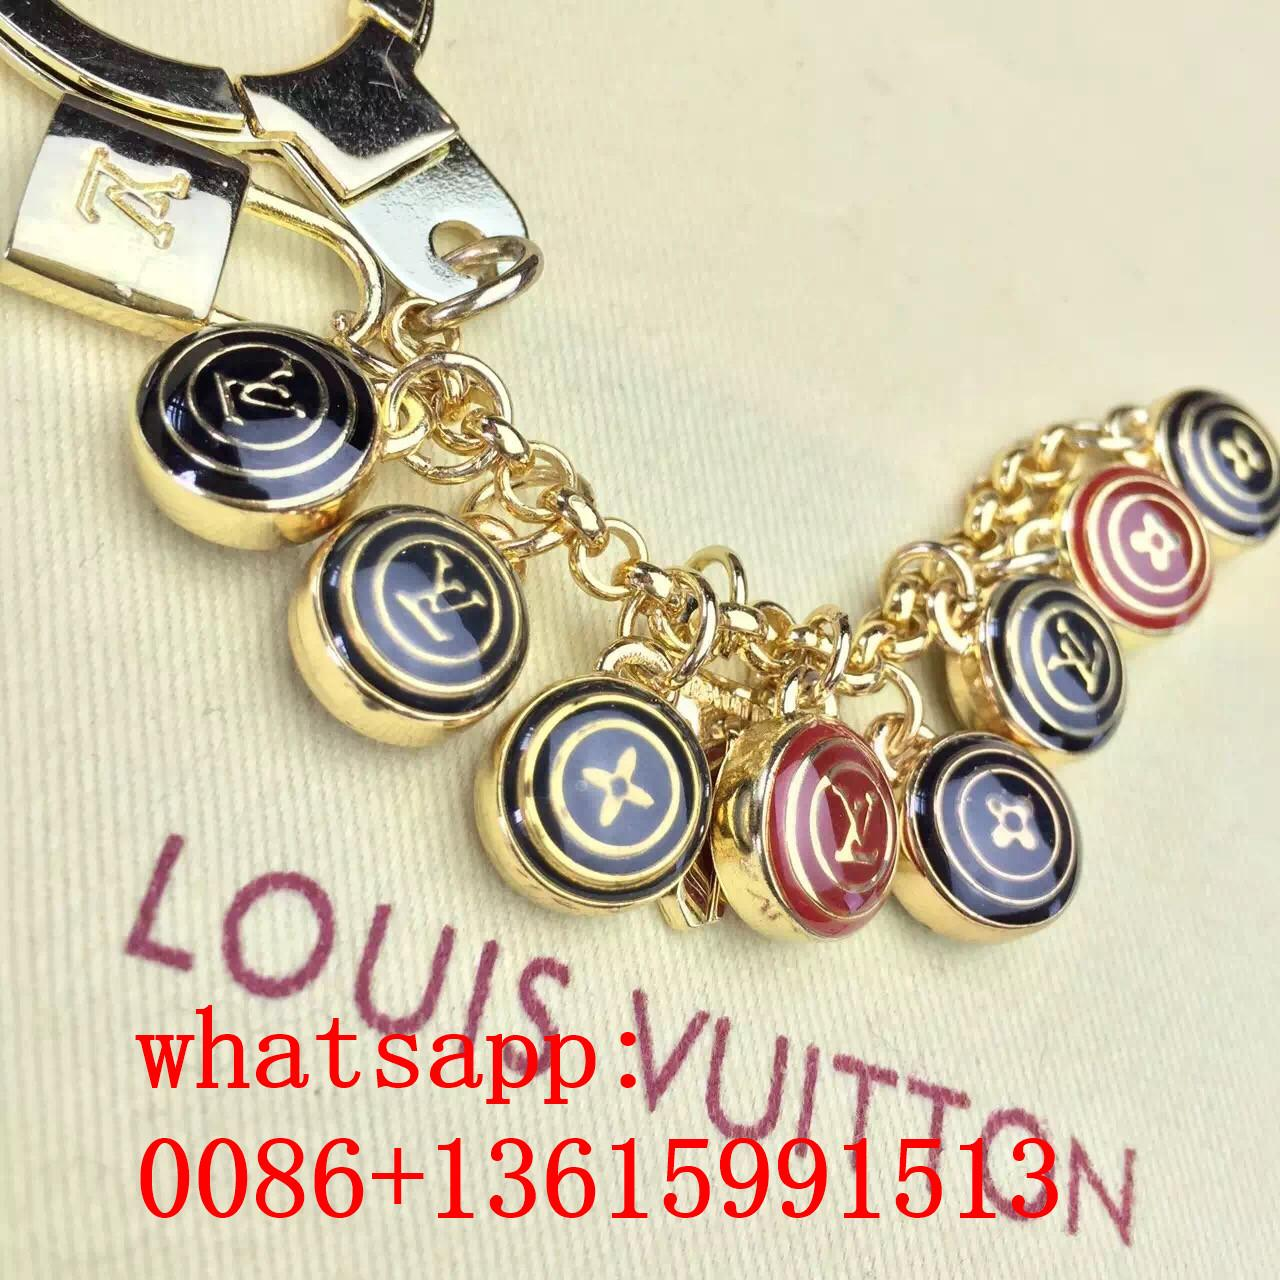 LV chains